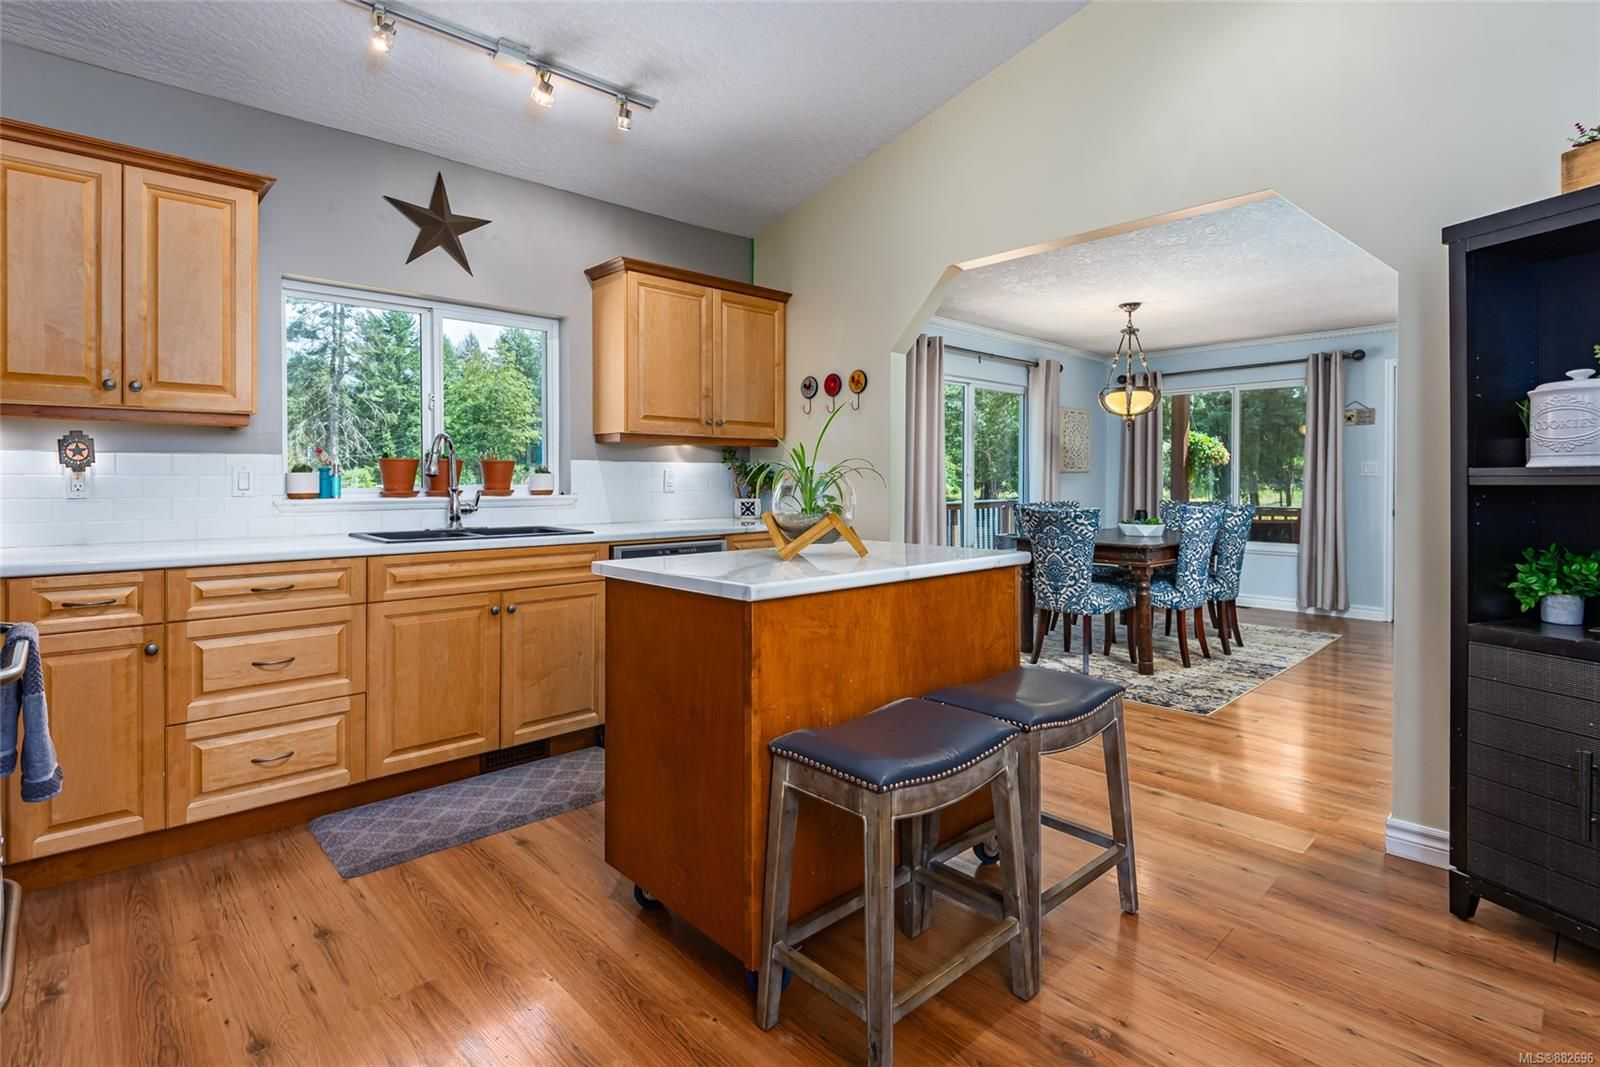 Photo 13: Photos: 3554 MacAulay Rd in : CV Merville Black Creek House for sale (Comox Valley)  : MLS®# 882696